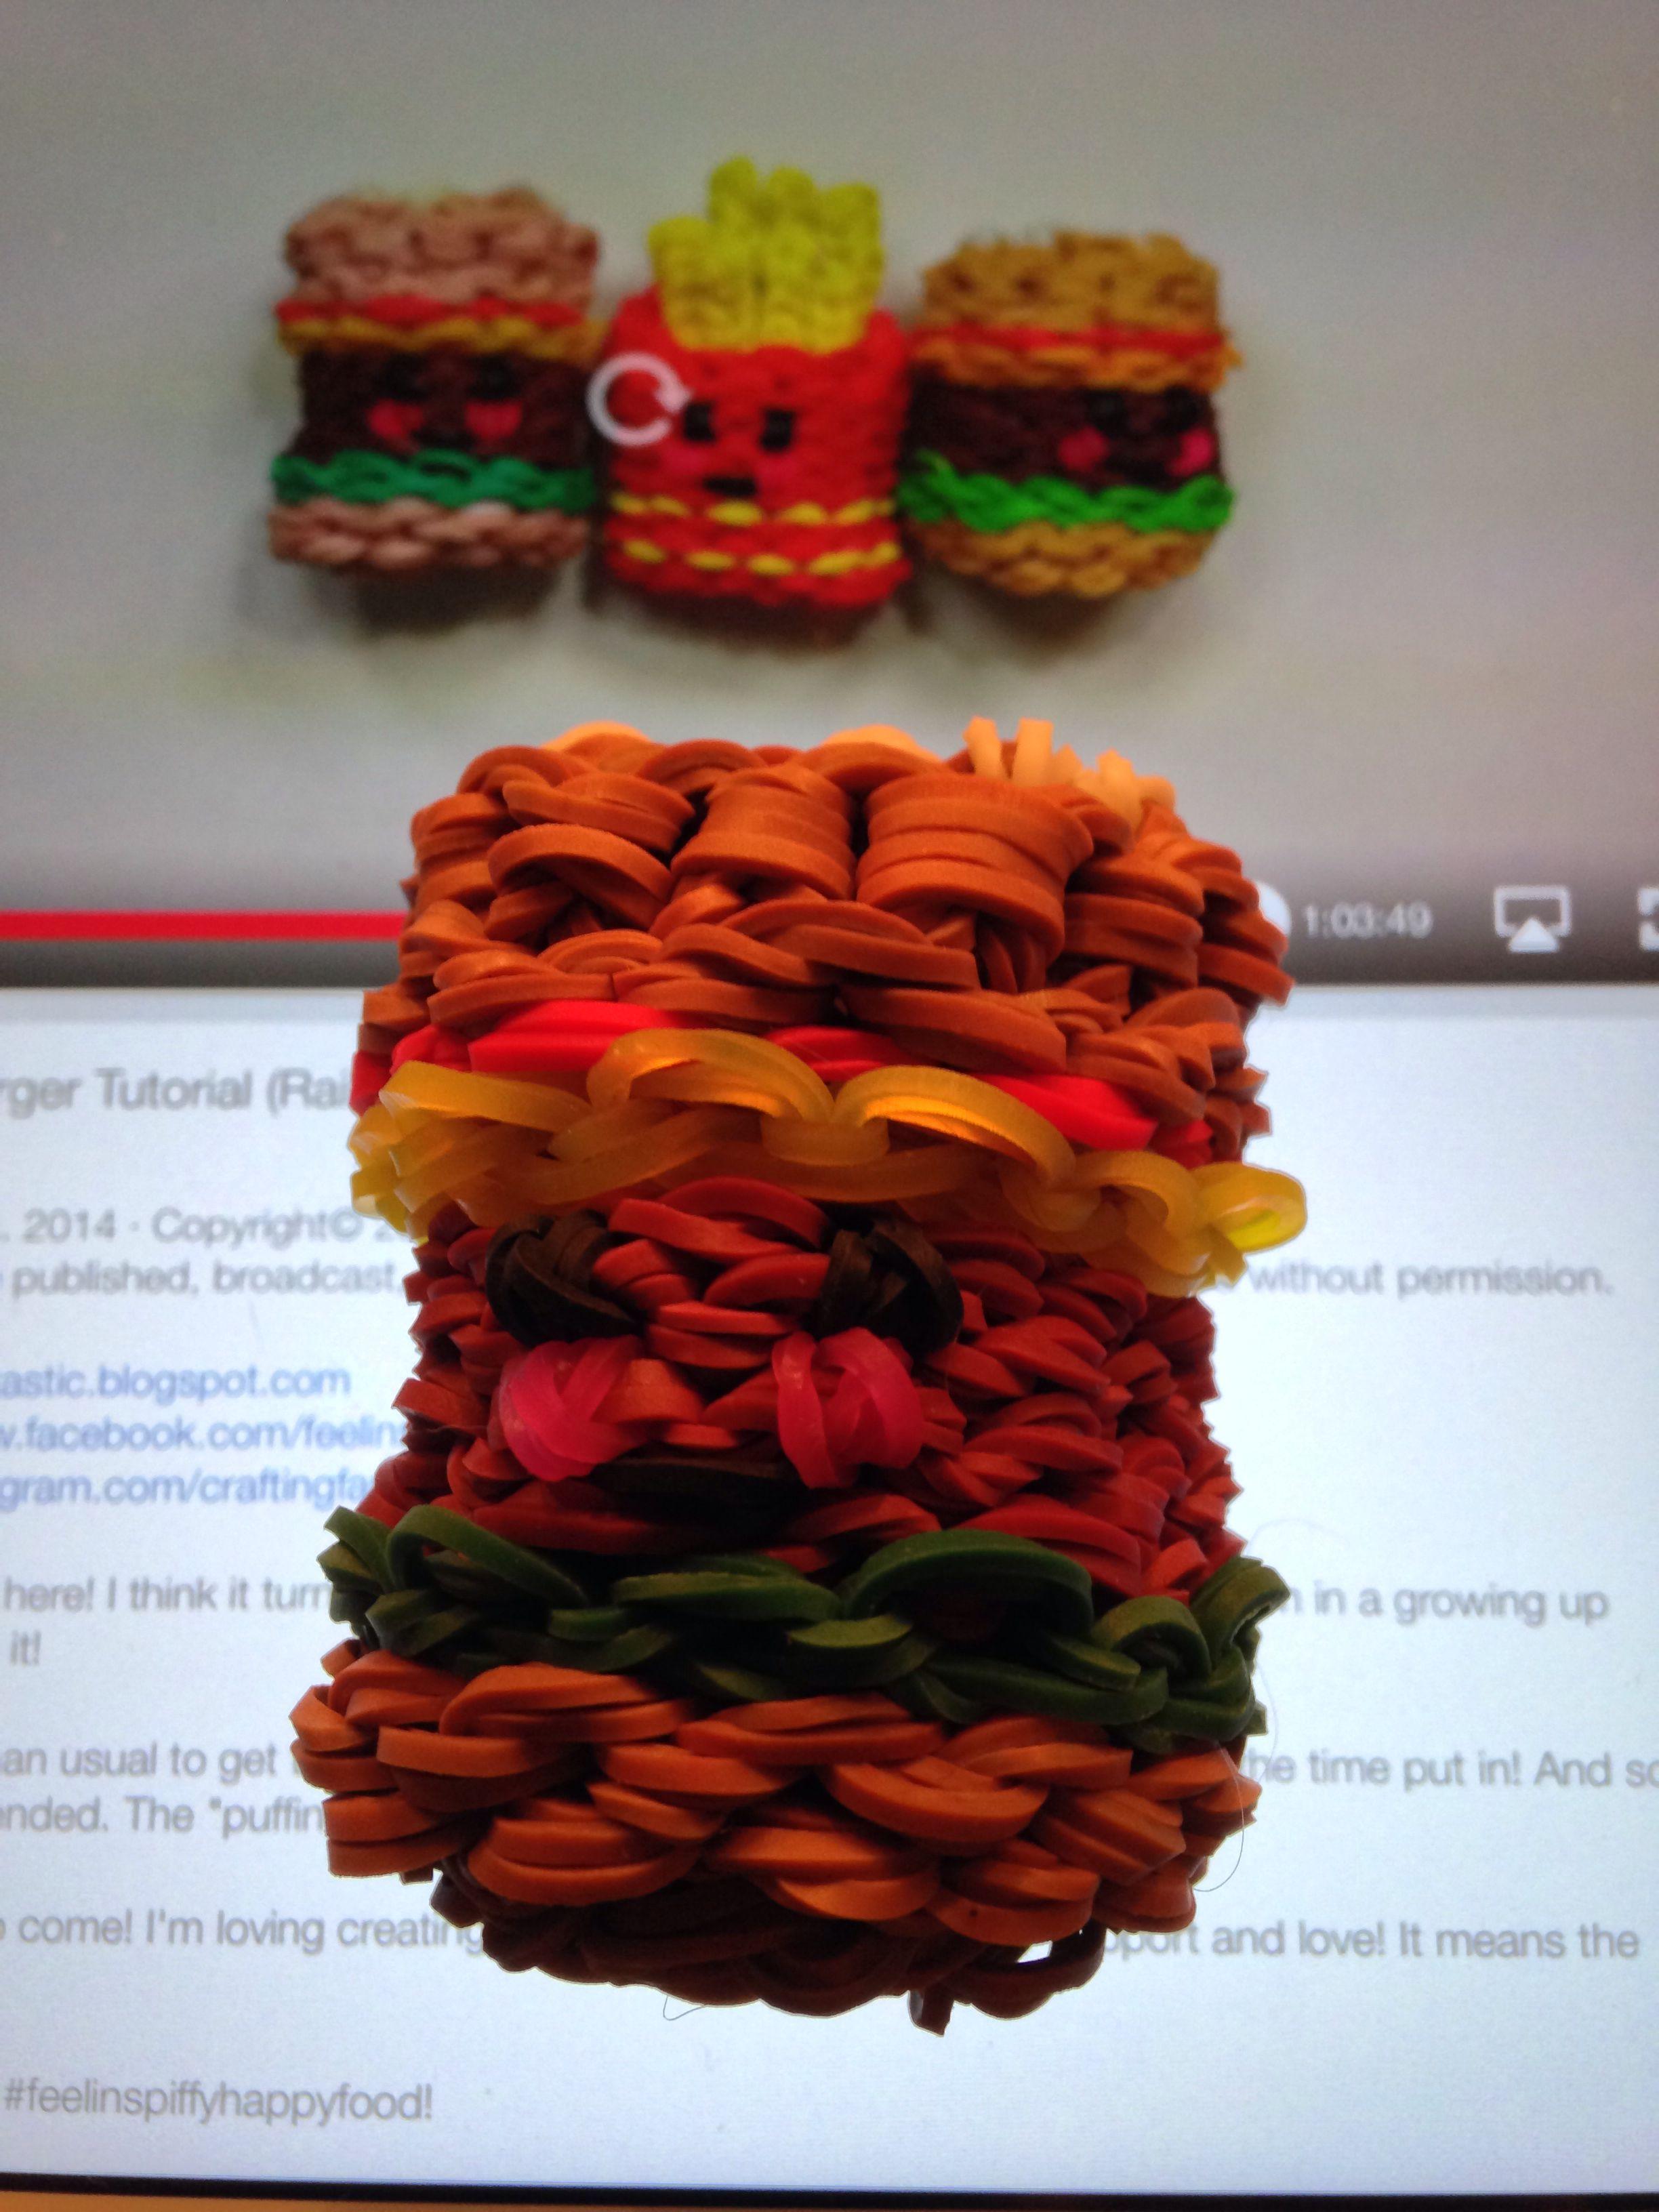 The happy hamburger! It is adorable!   #feelinspiffy